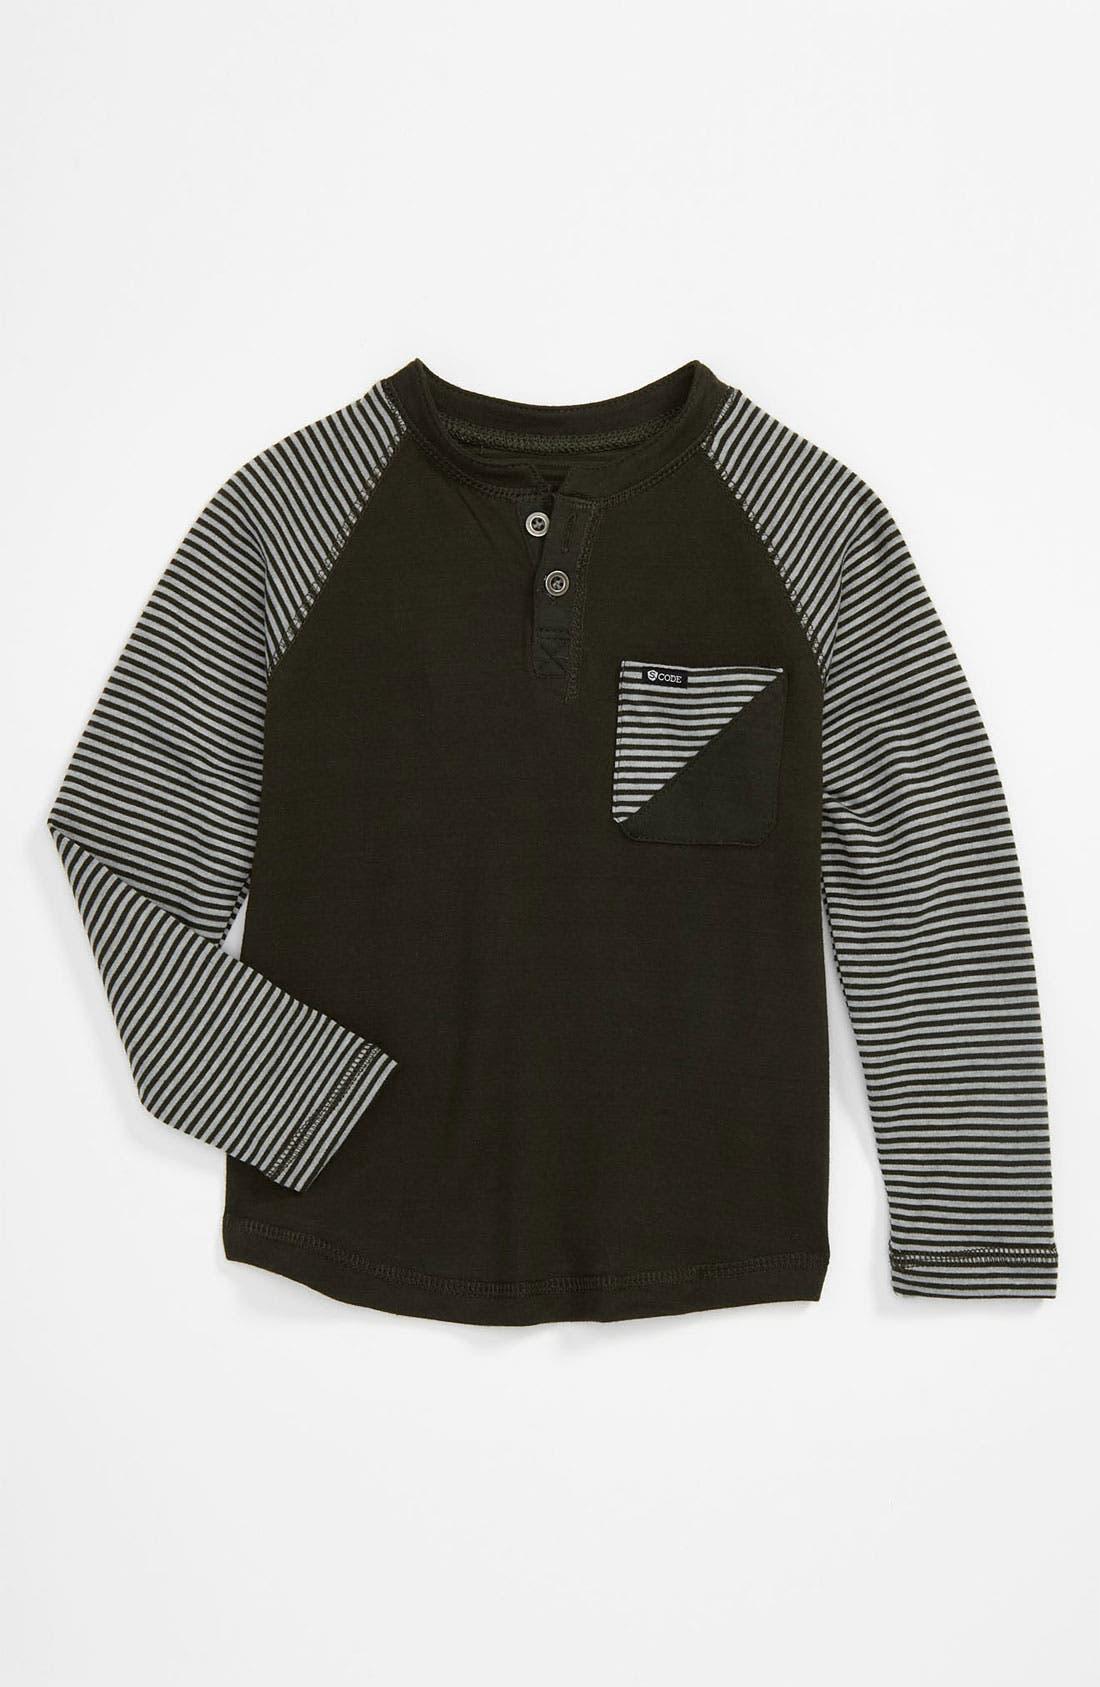 Alternate Image 1 Selected - Sovereign Code Henley Shirt (Toddler)